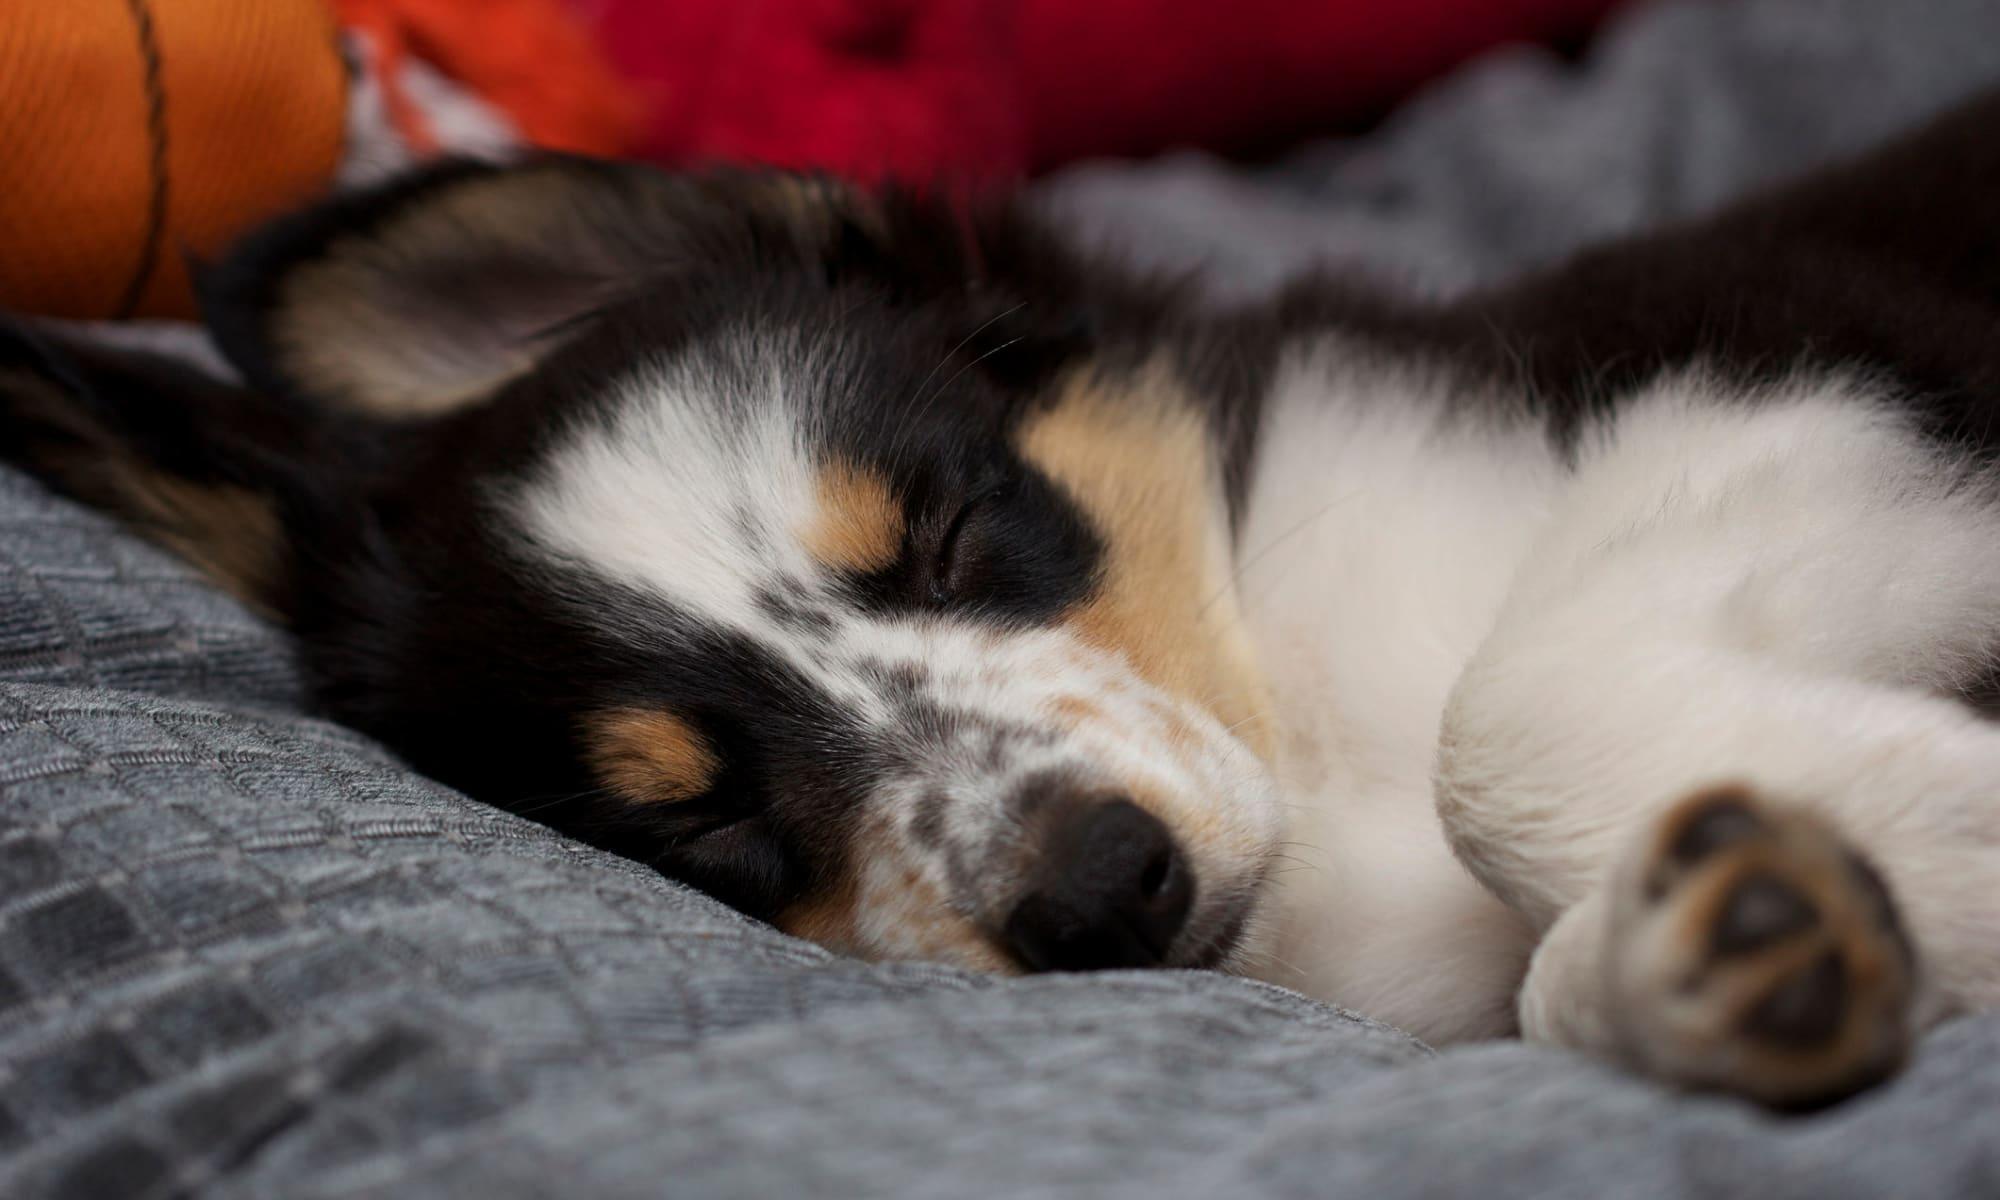 Puppy sleeping on dog bed.